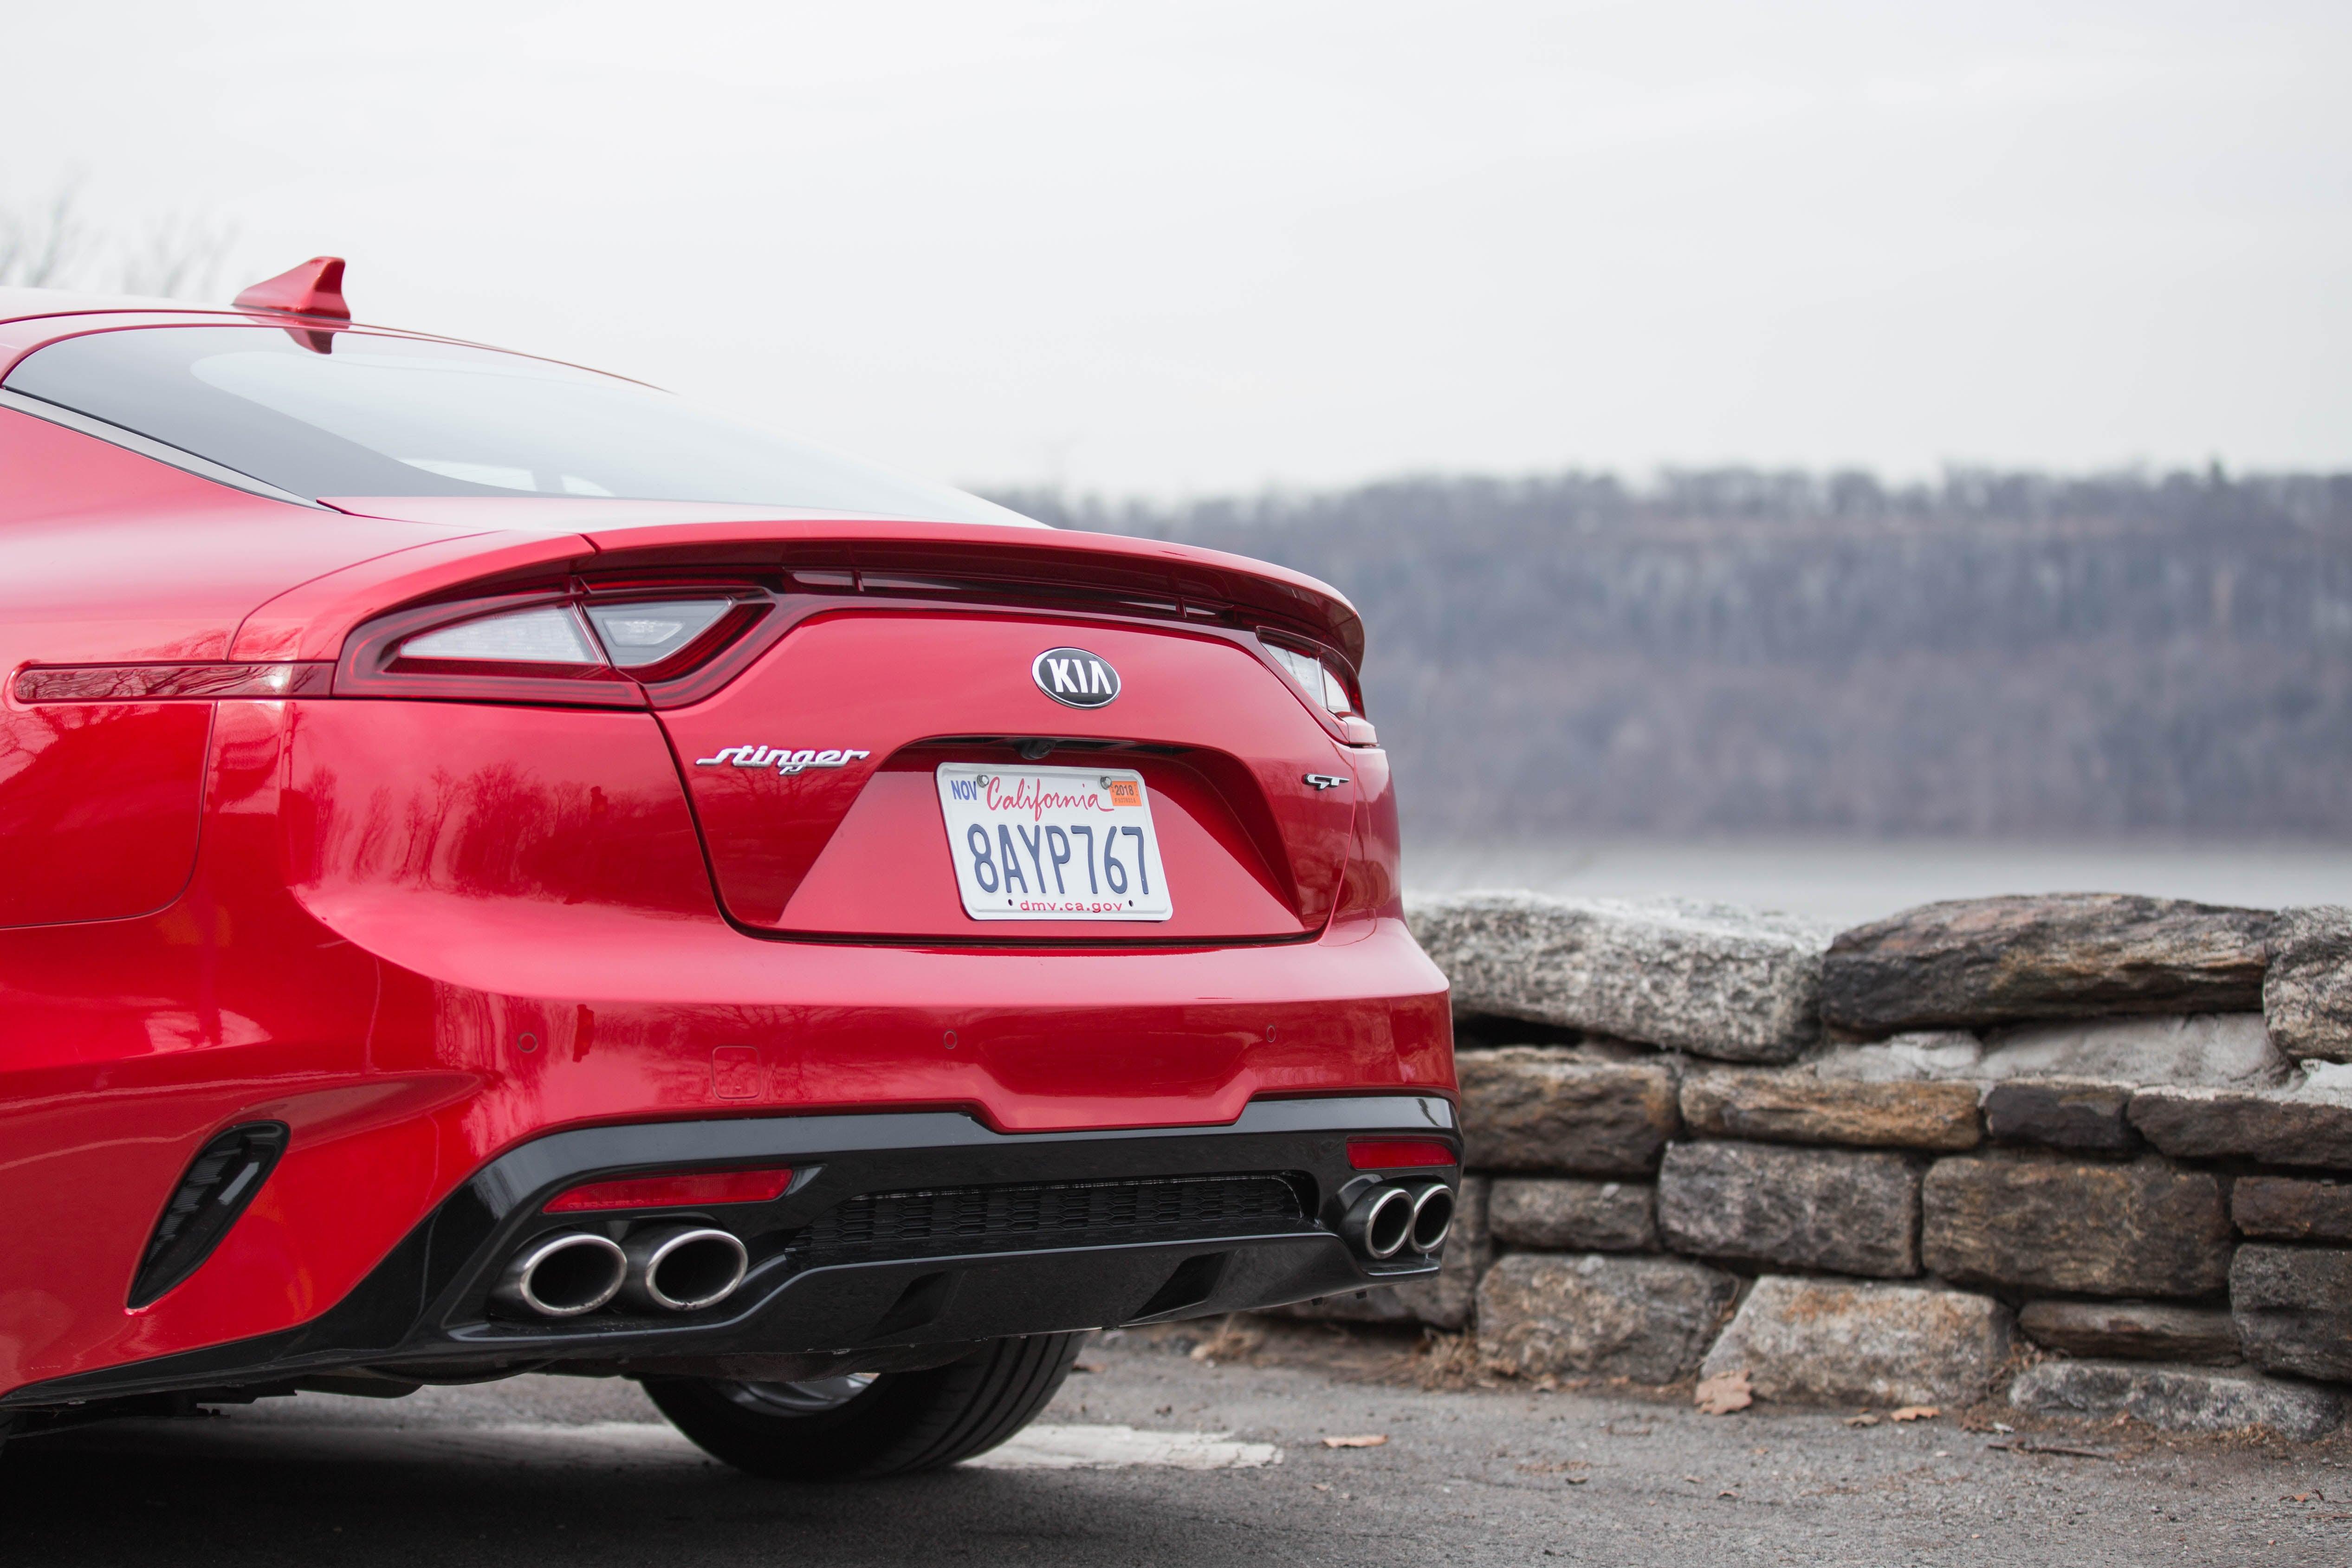 Consumer Electronics Stinger More Discounts Surprises Vehicle Electronics & Gps